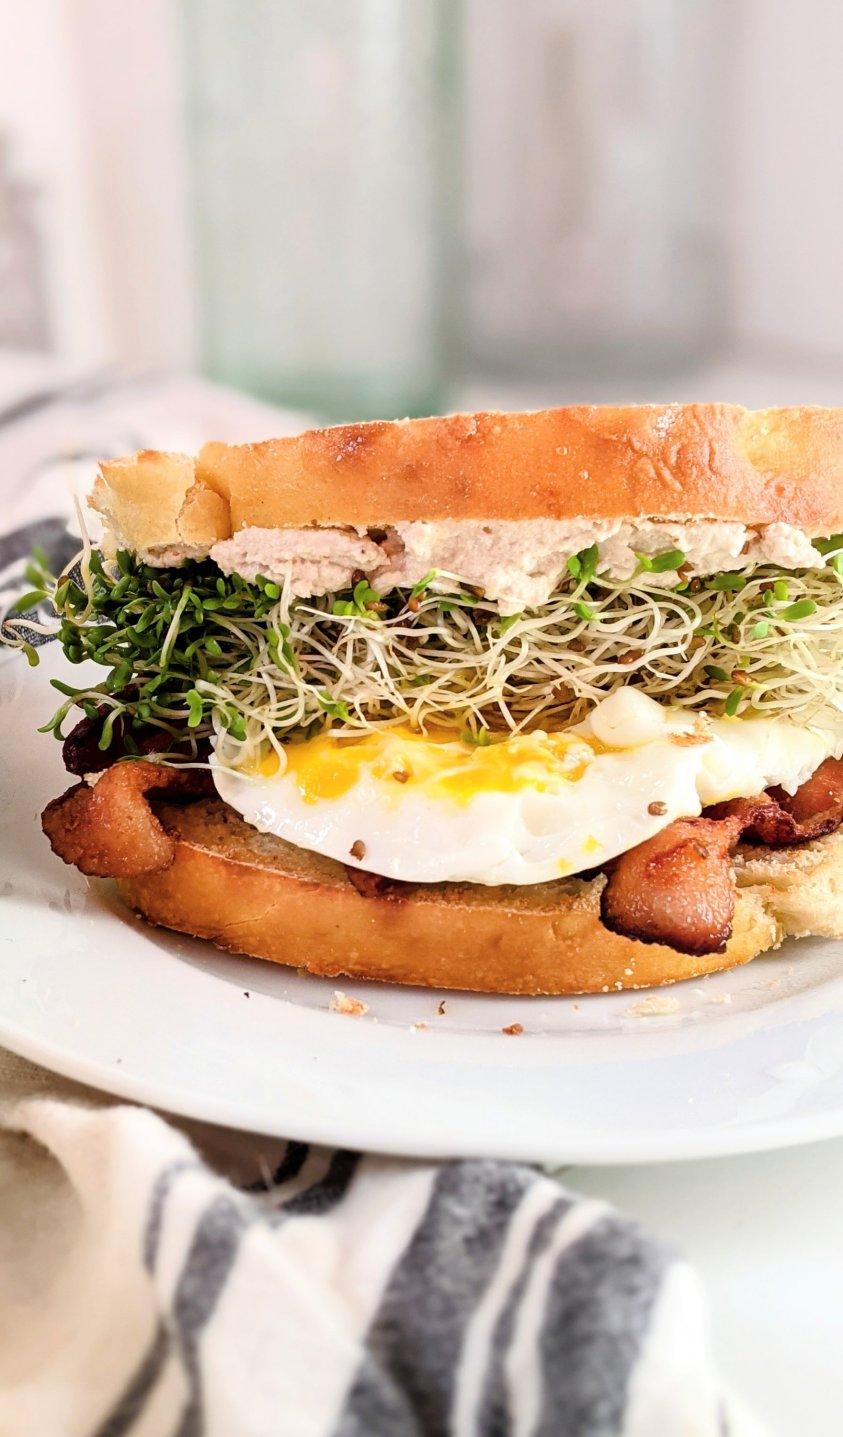 brioche breakfast sandwich recipe wbacon and egg brioche sandwiches extra brunch recipes popular best brunches easy make your own breakfast sandwich bar with brioche bread